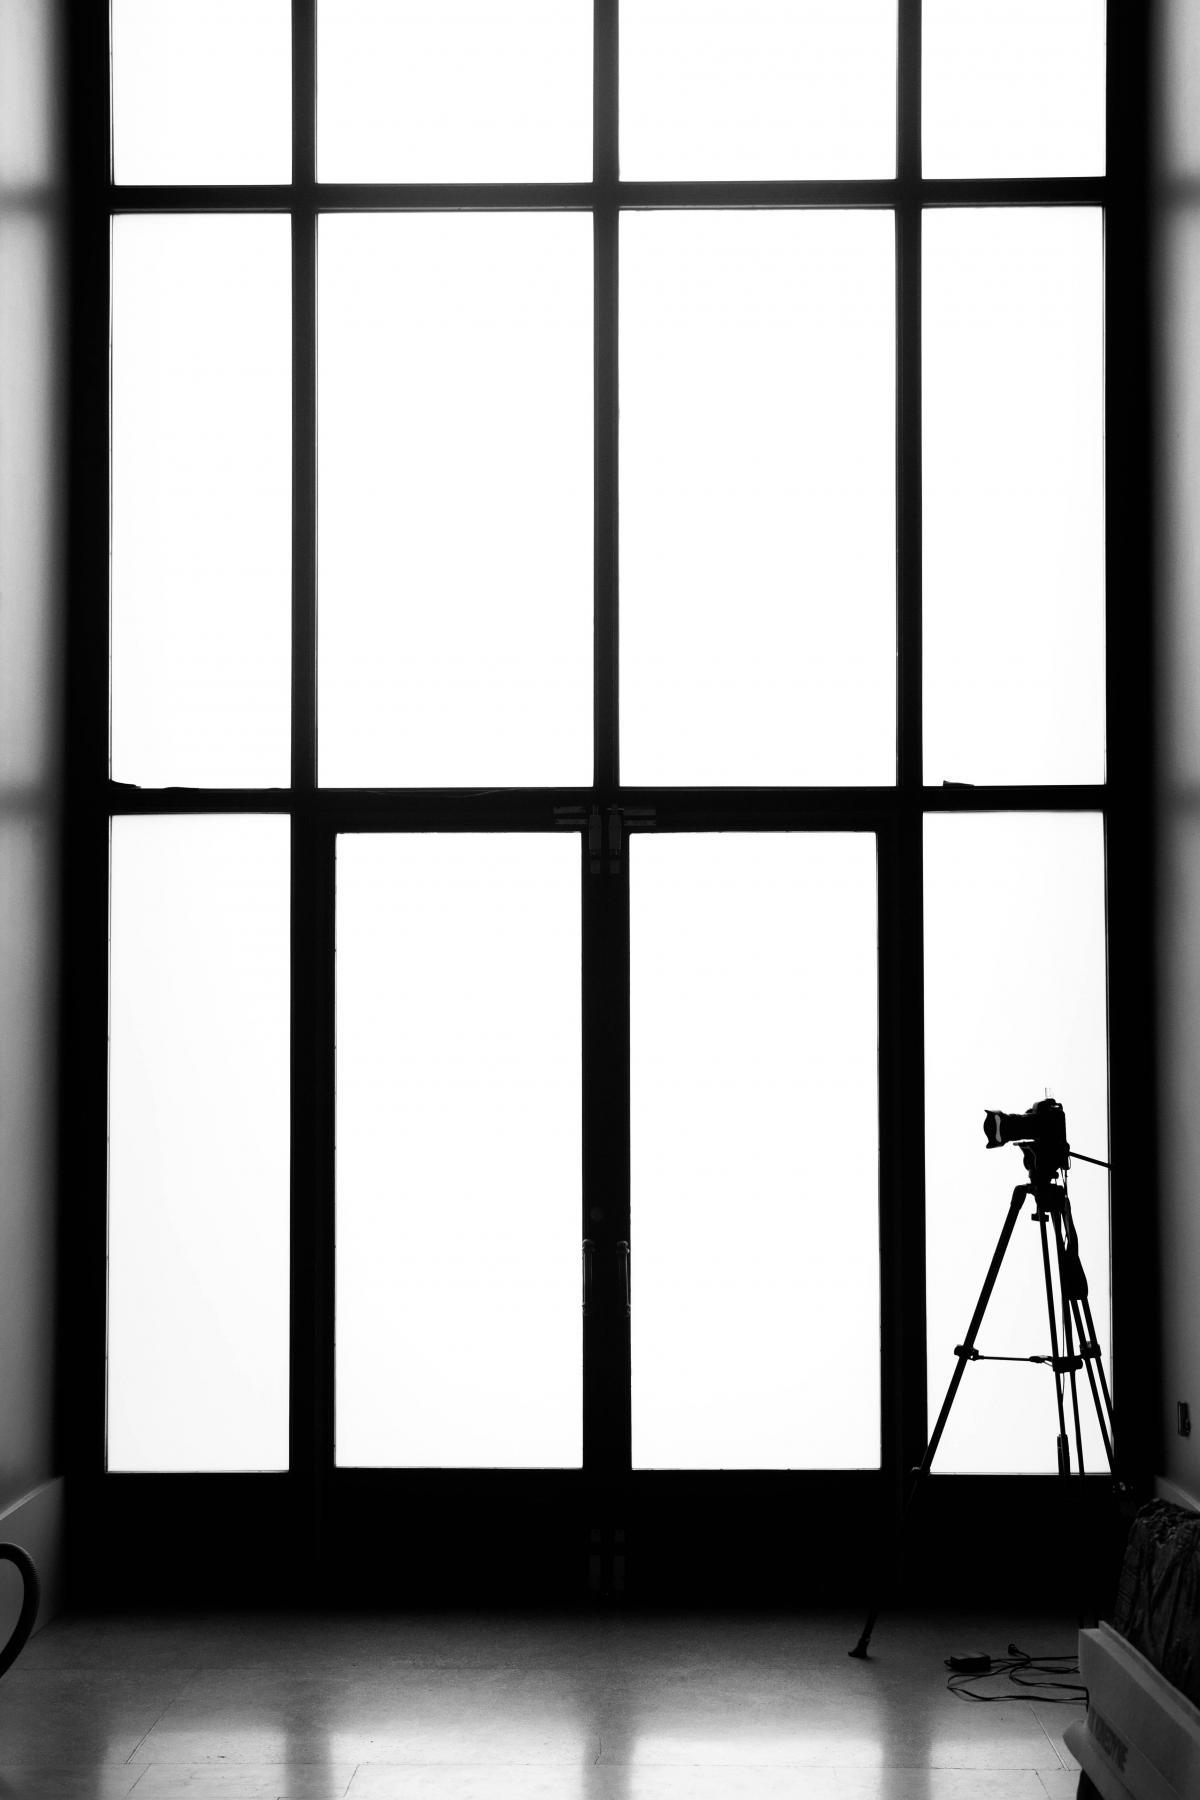 Frame Photographer Blank